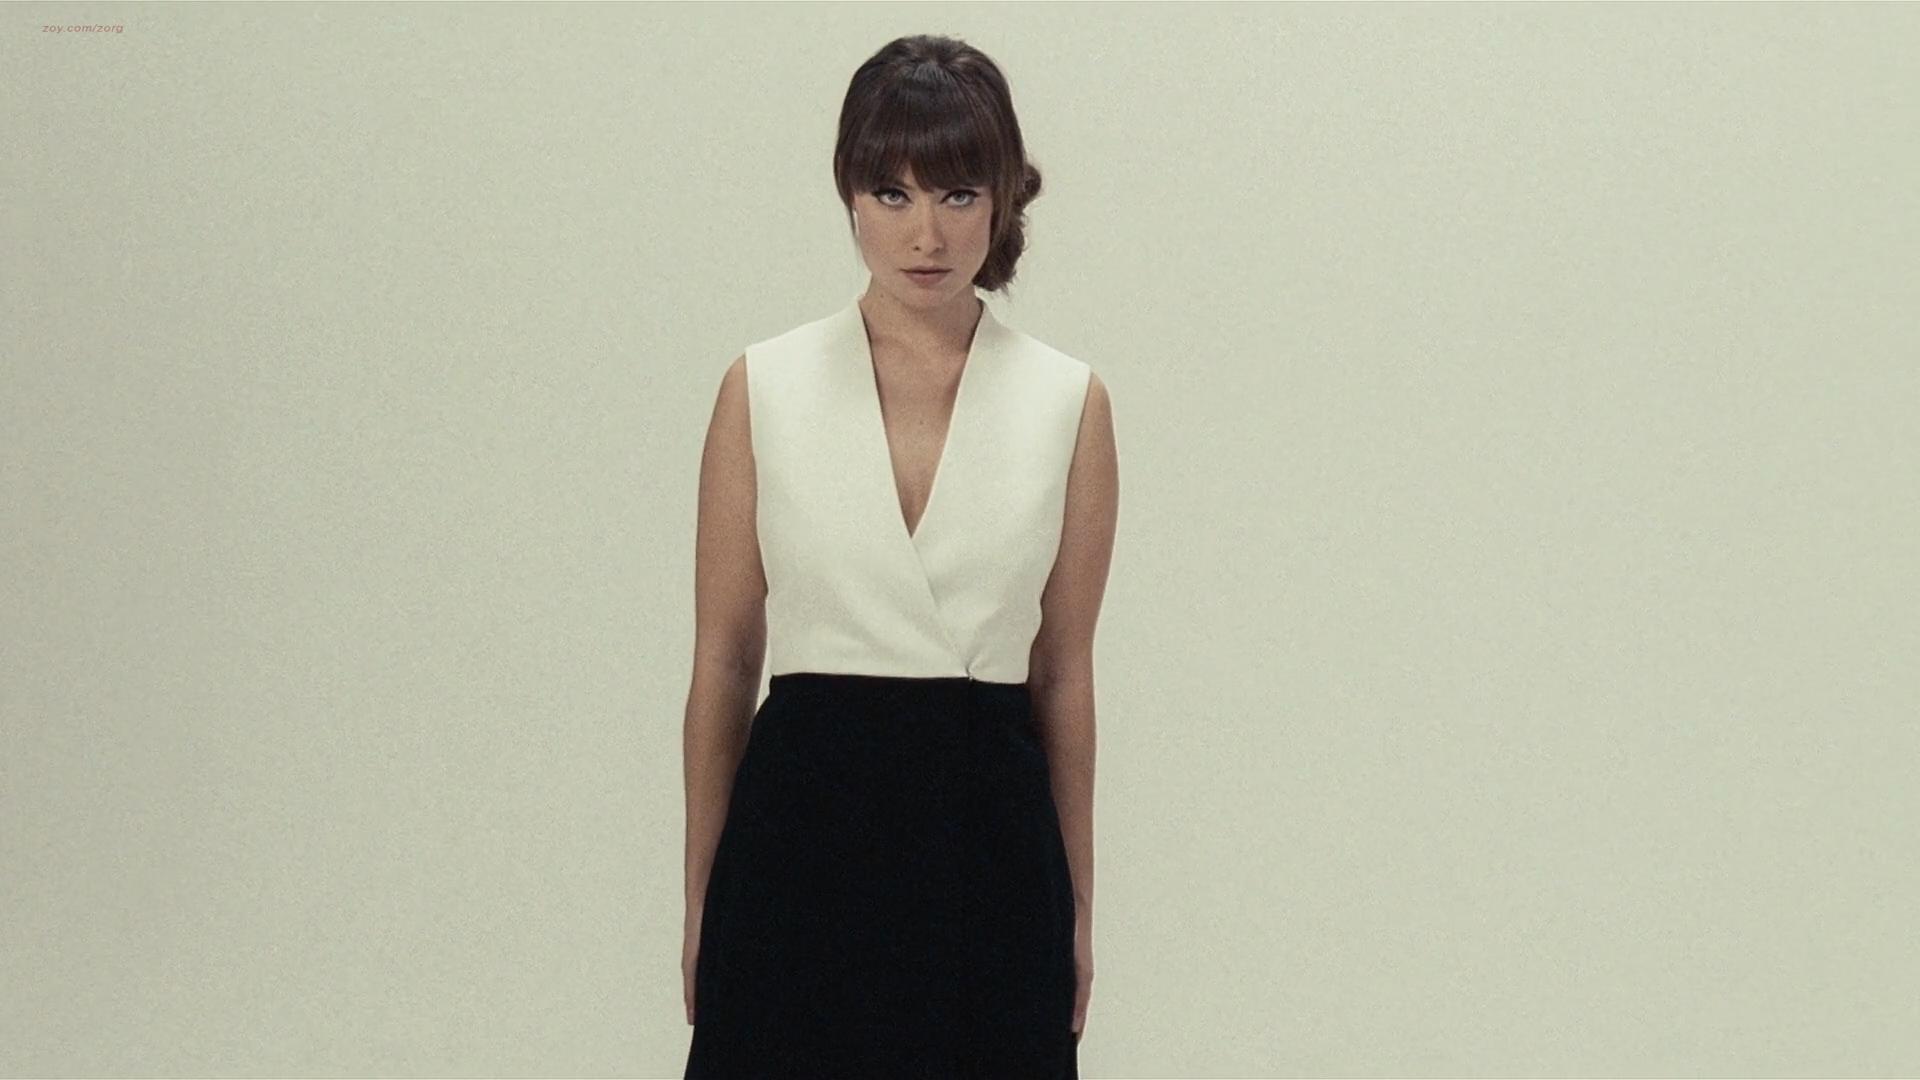 Olivia Wilde hot sexy and pokies - The Longest Week (2014) hd1080p (1)